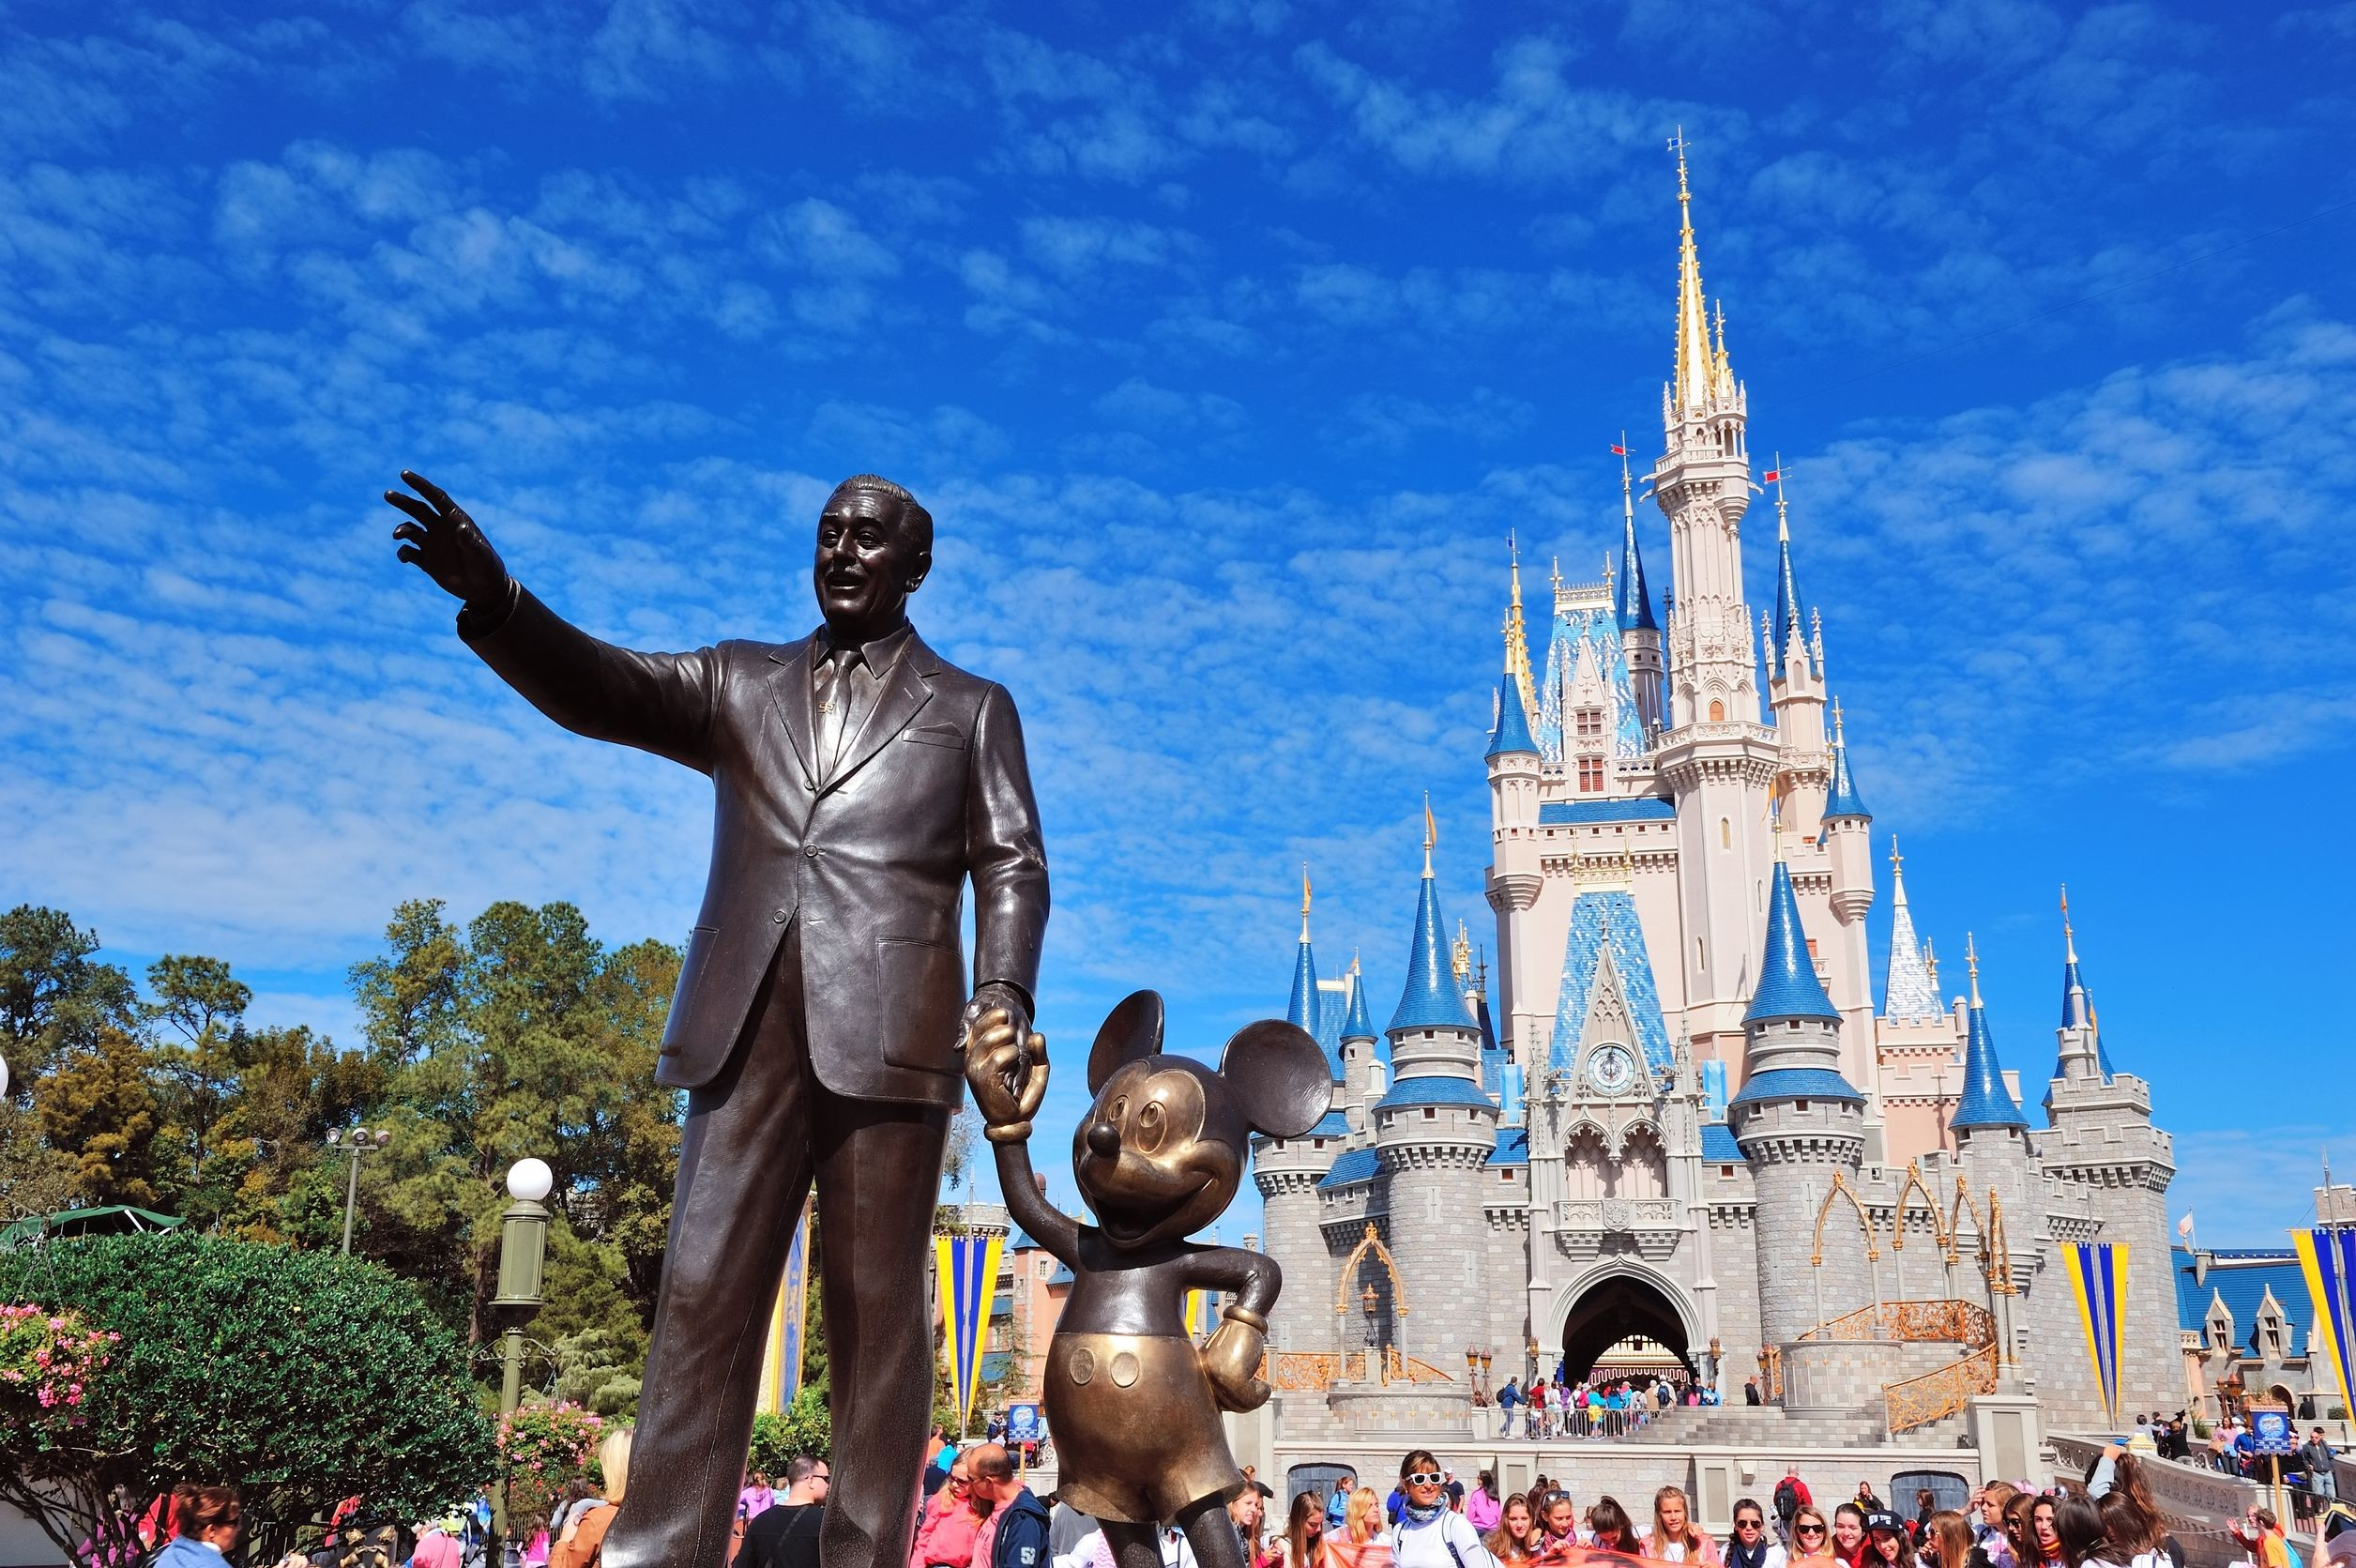 walt disney world - most popular amusement park in the world